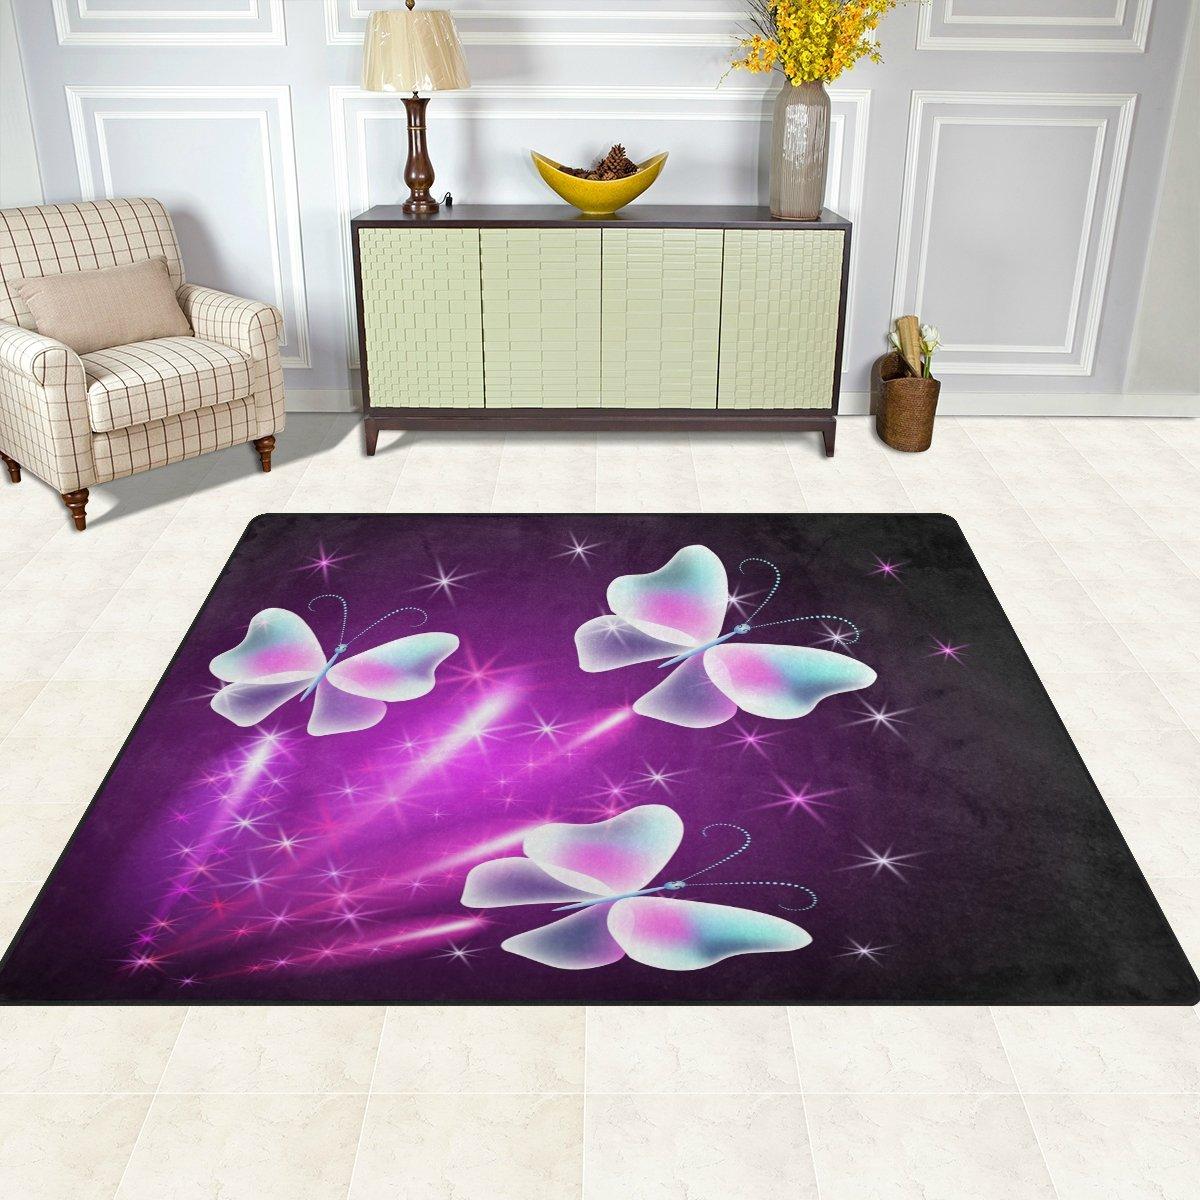 FFY GO Area Rug, Butterfly Star Mystical Purple Pink Print Carpet Designer Super Soft Polyester Large Non-Slip Modern Bath Mats for Bedroom Living Room Hall Dinner Table Home Decor 48 x 63 inch